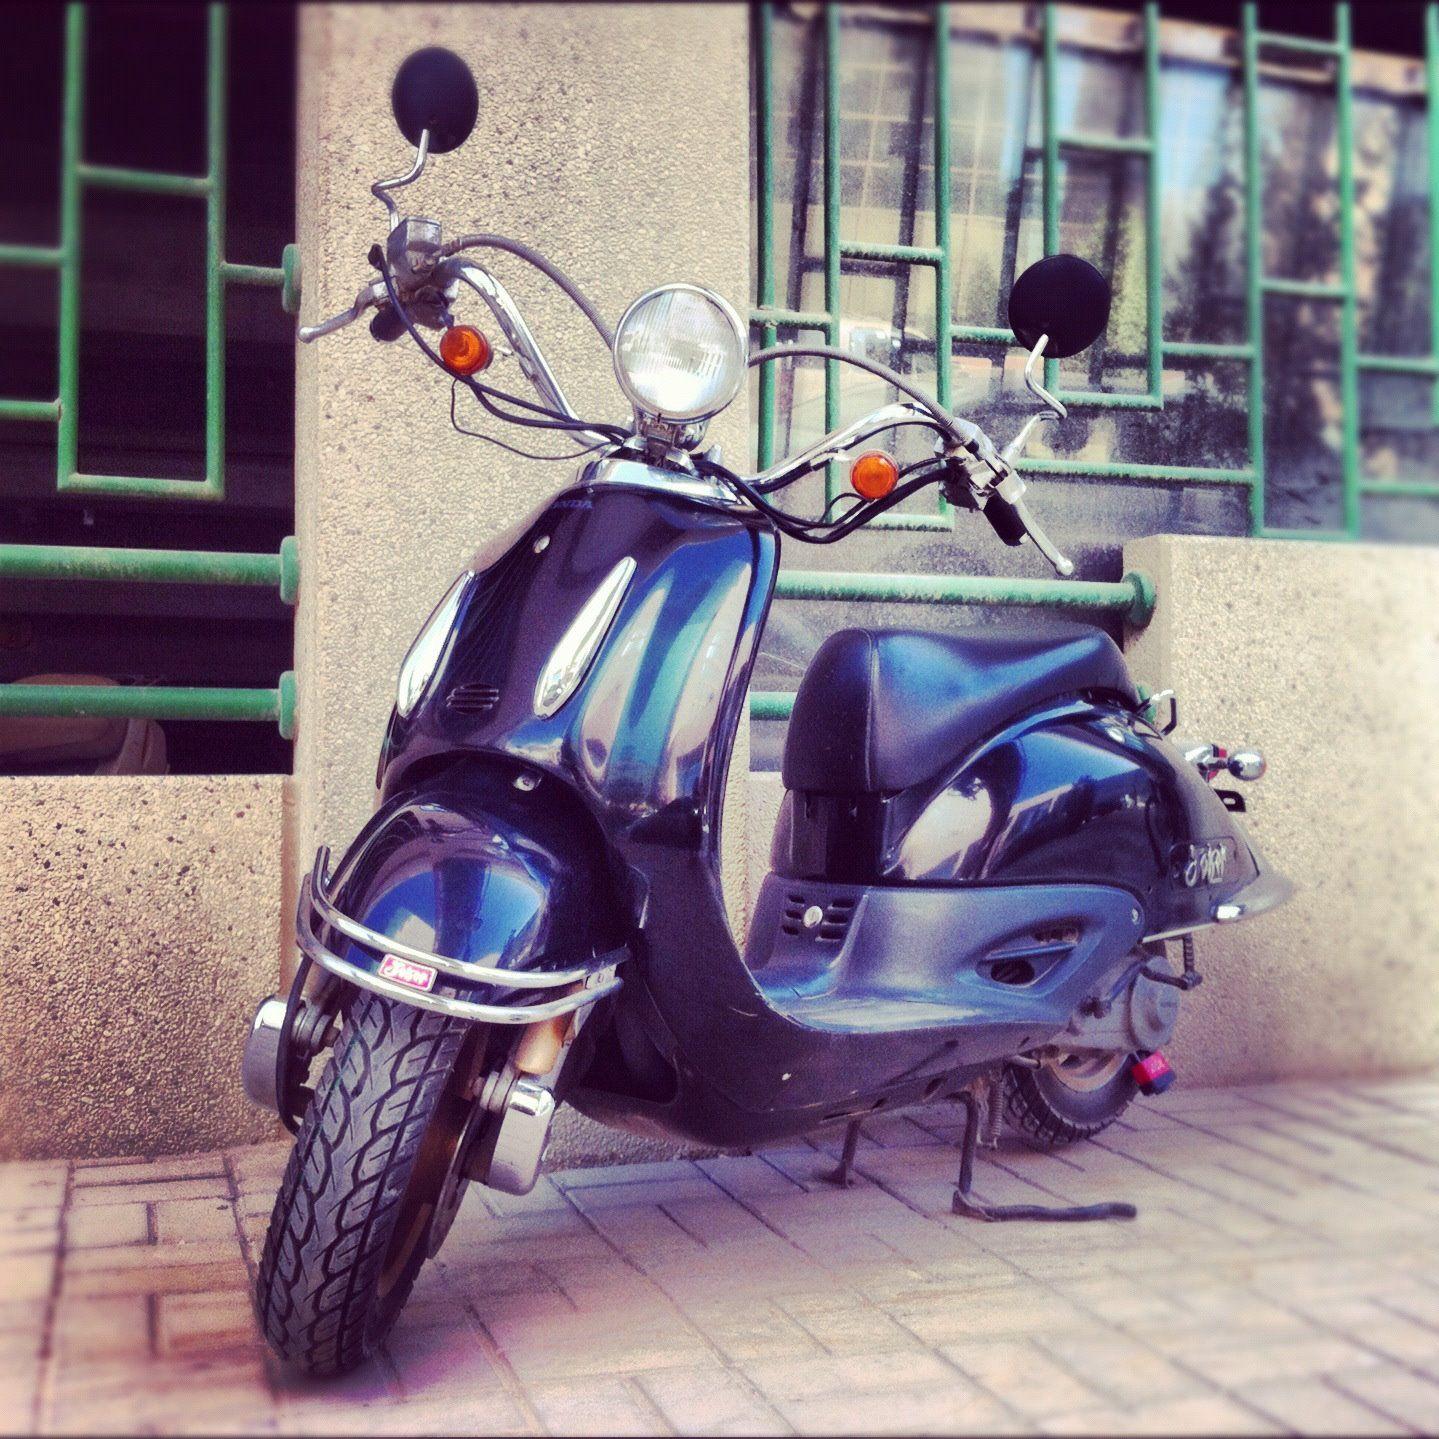 my Honda Joker